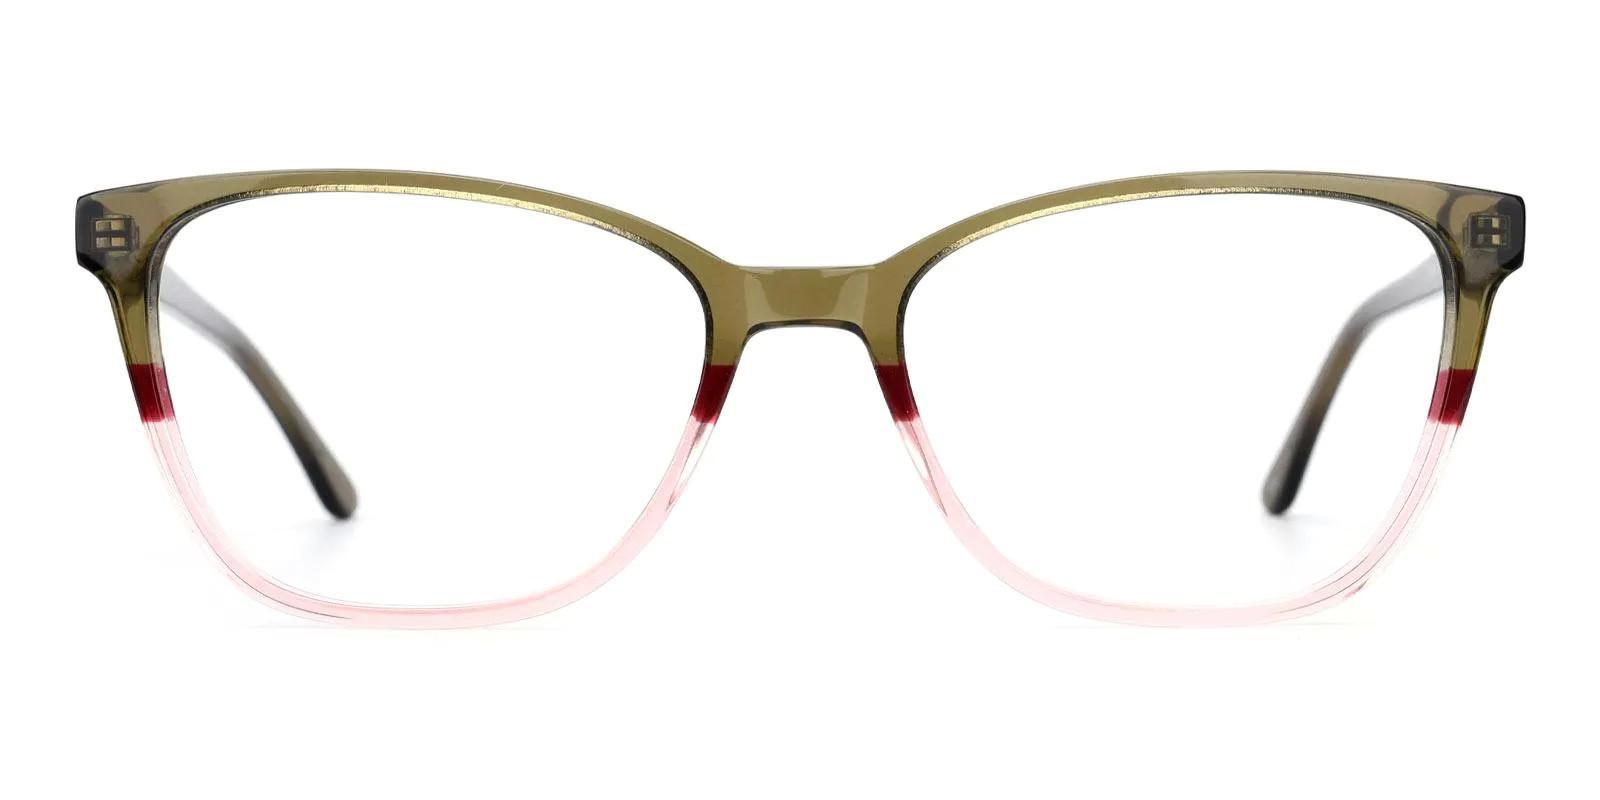 Rosemary Green Acetate Eyeglasses , Fashion , SpringHinges , UniversalBridgeFit Frames from ABBE Glasses